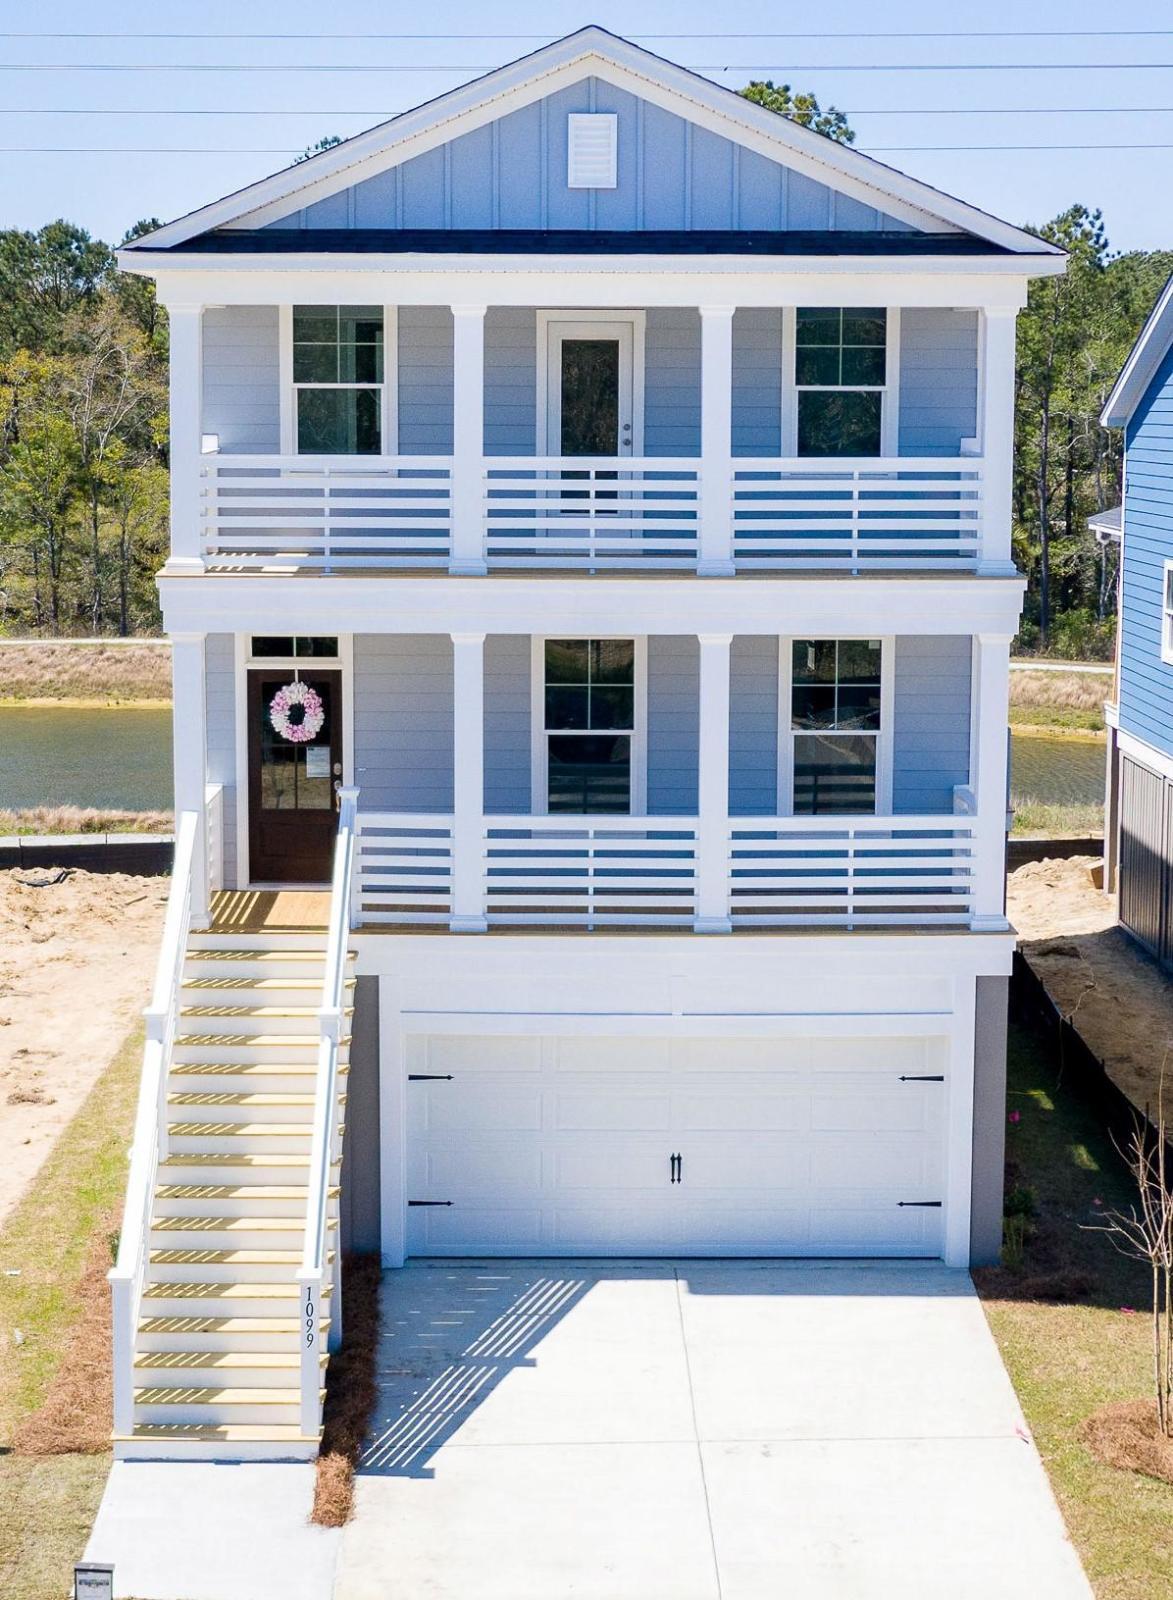 James Island Homes For Sale - 1397 Harbor View, Charleston, SC - 11